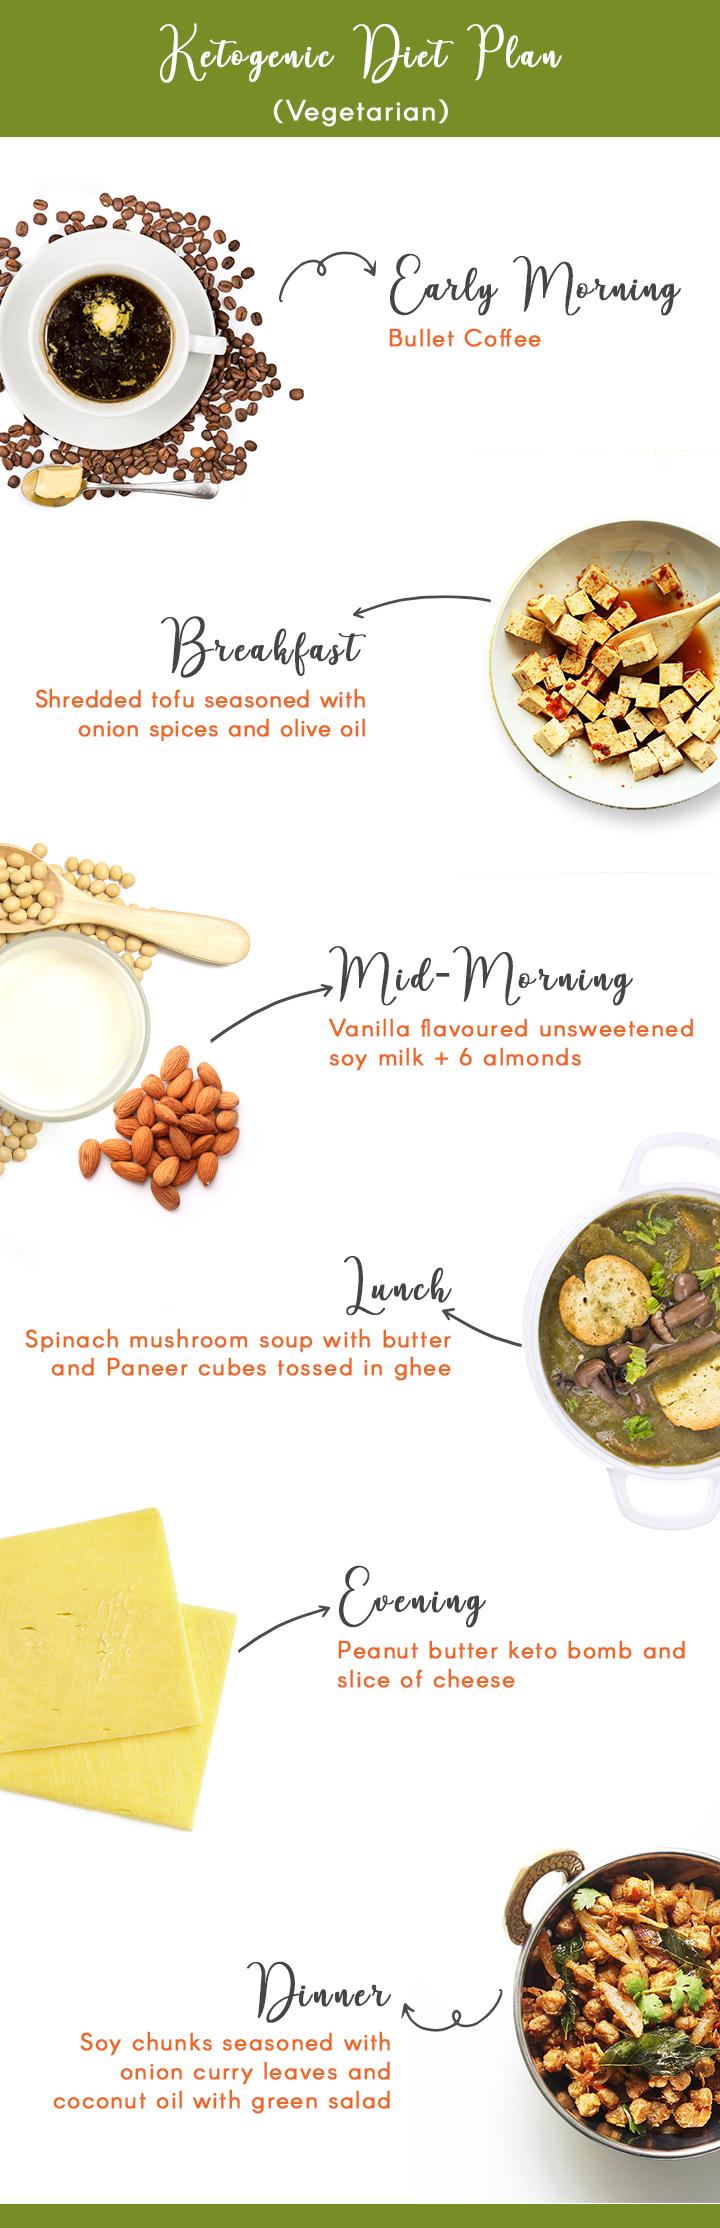 Vegetarian Keto Diet Plan